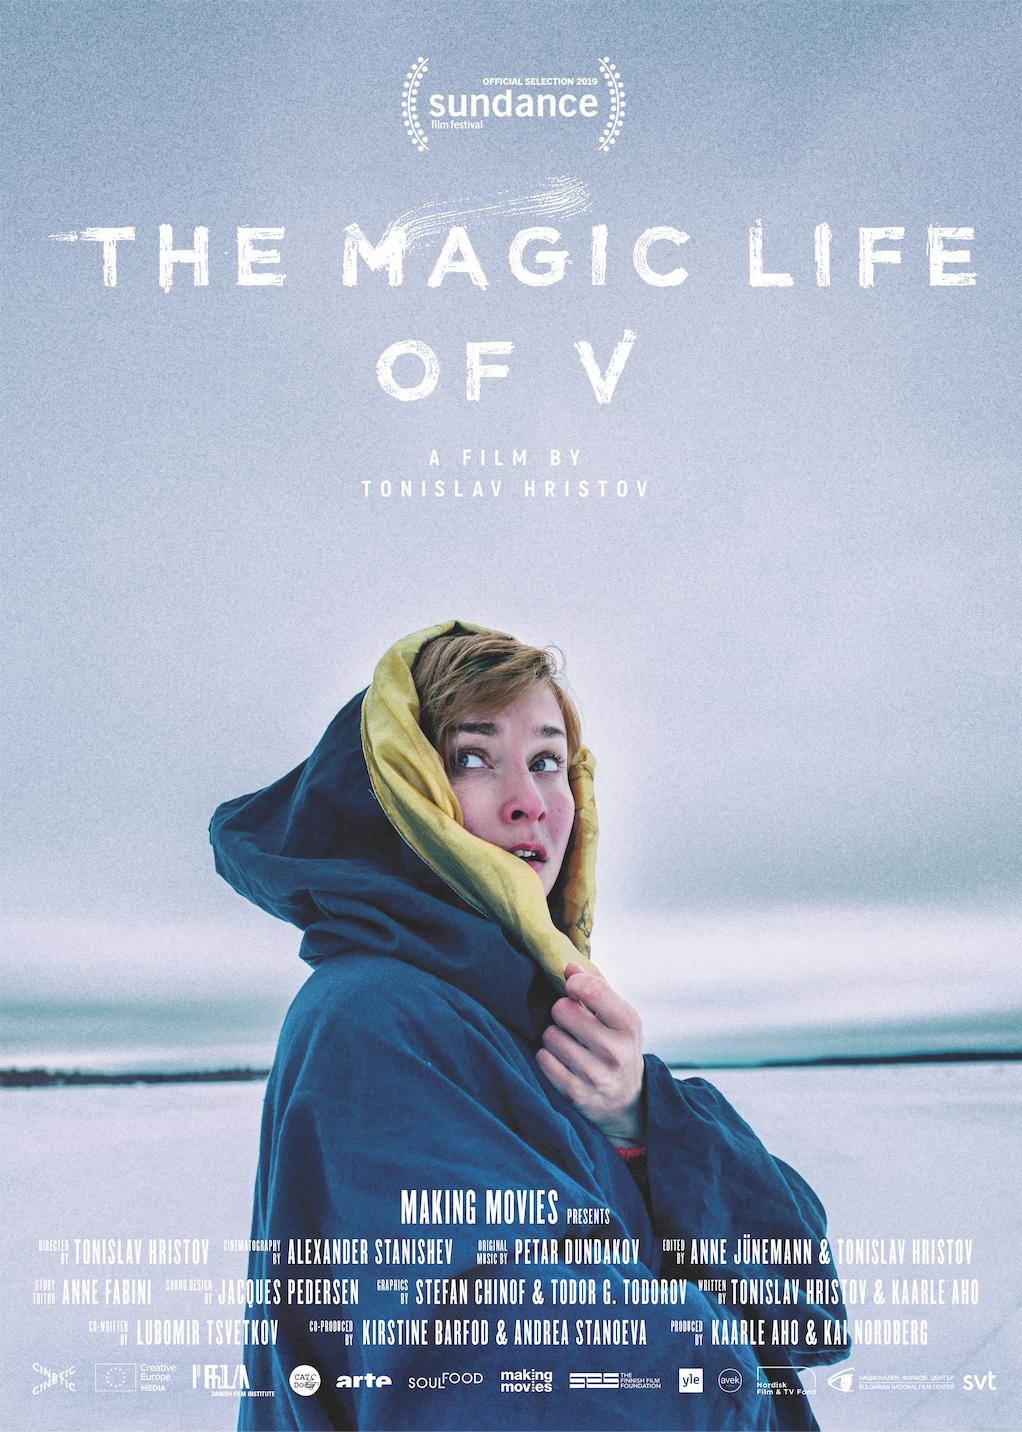 TONISLAV HRISTOV'S 'THE MAGIC LIFE OF V' TO HAVE WORLD